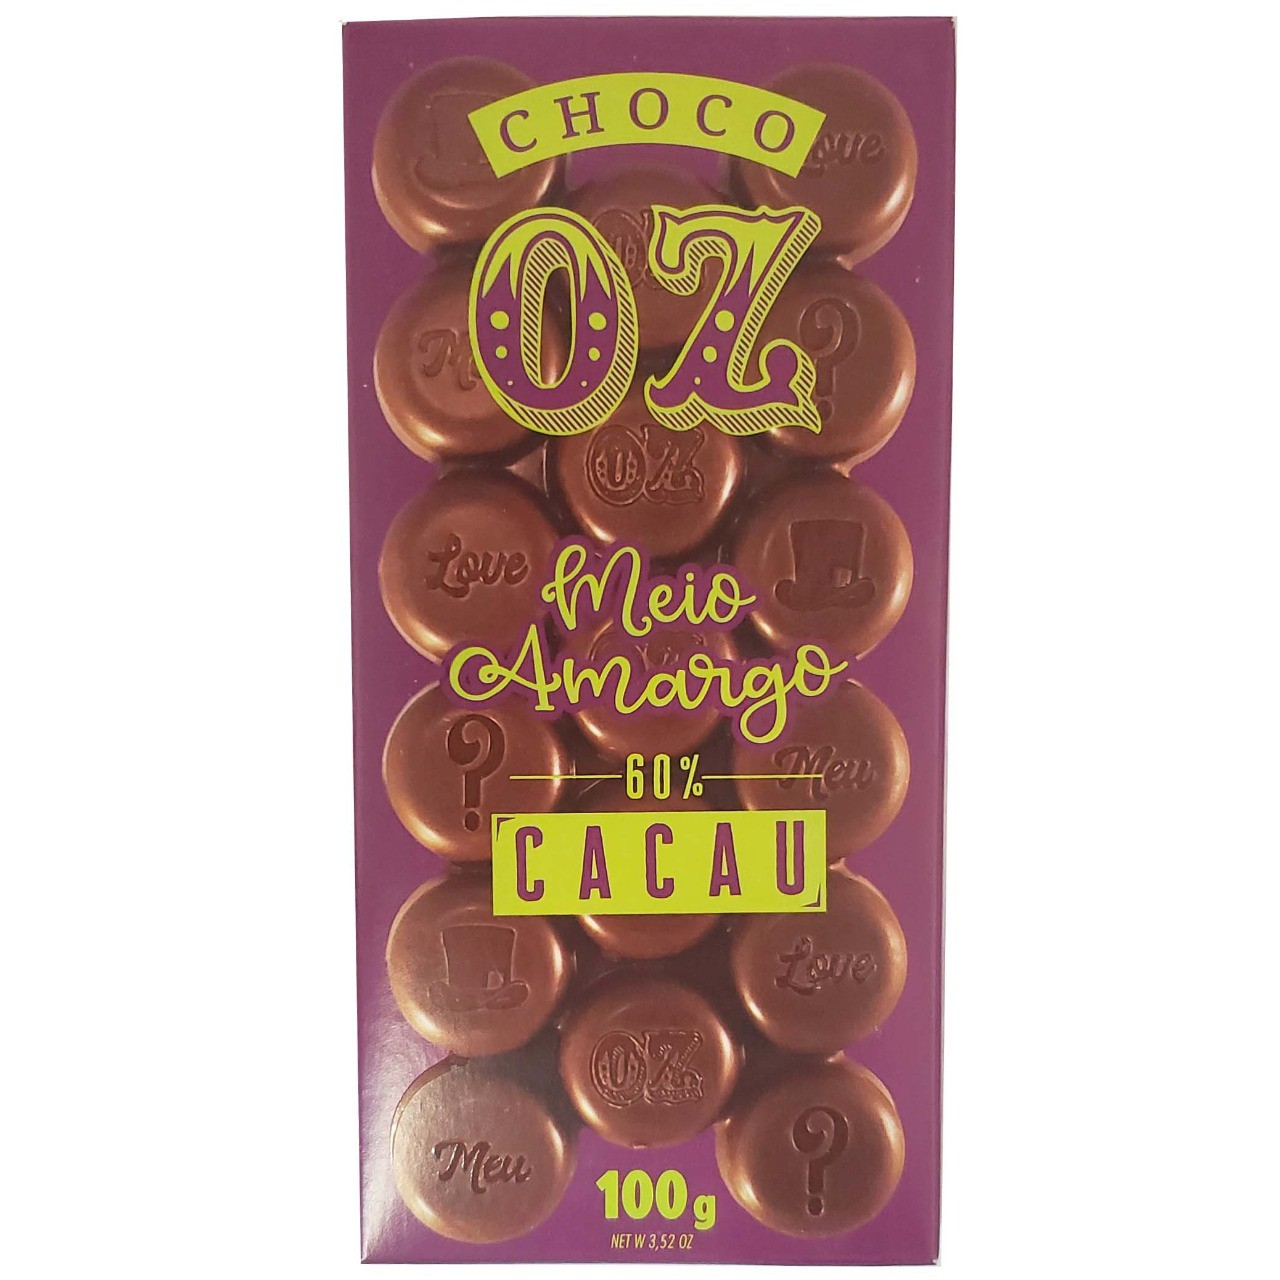 Chocolate Meio Amargo 60% Cacau Choco OZ - 100g -